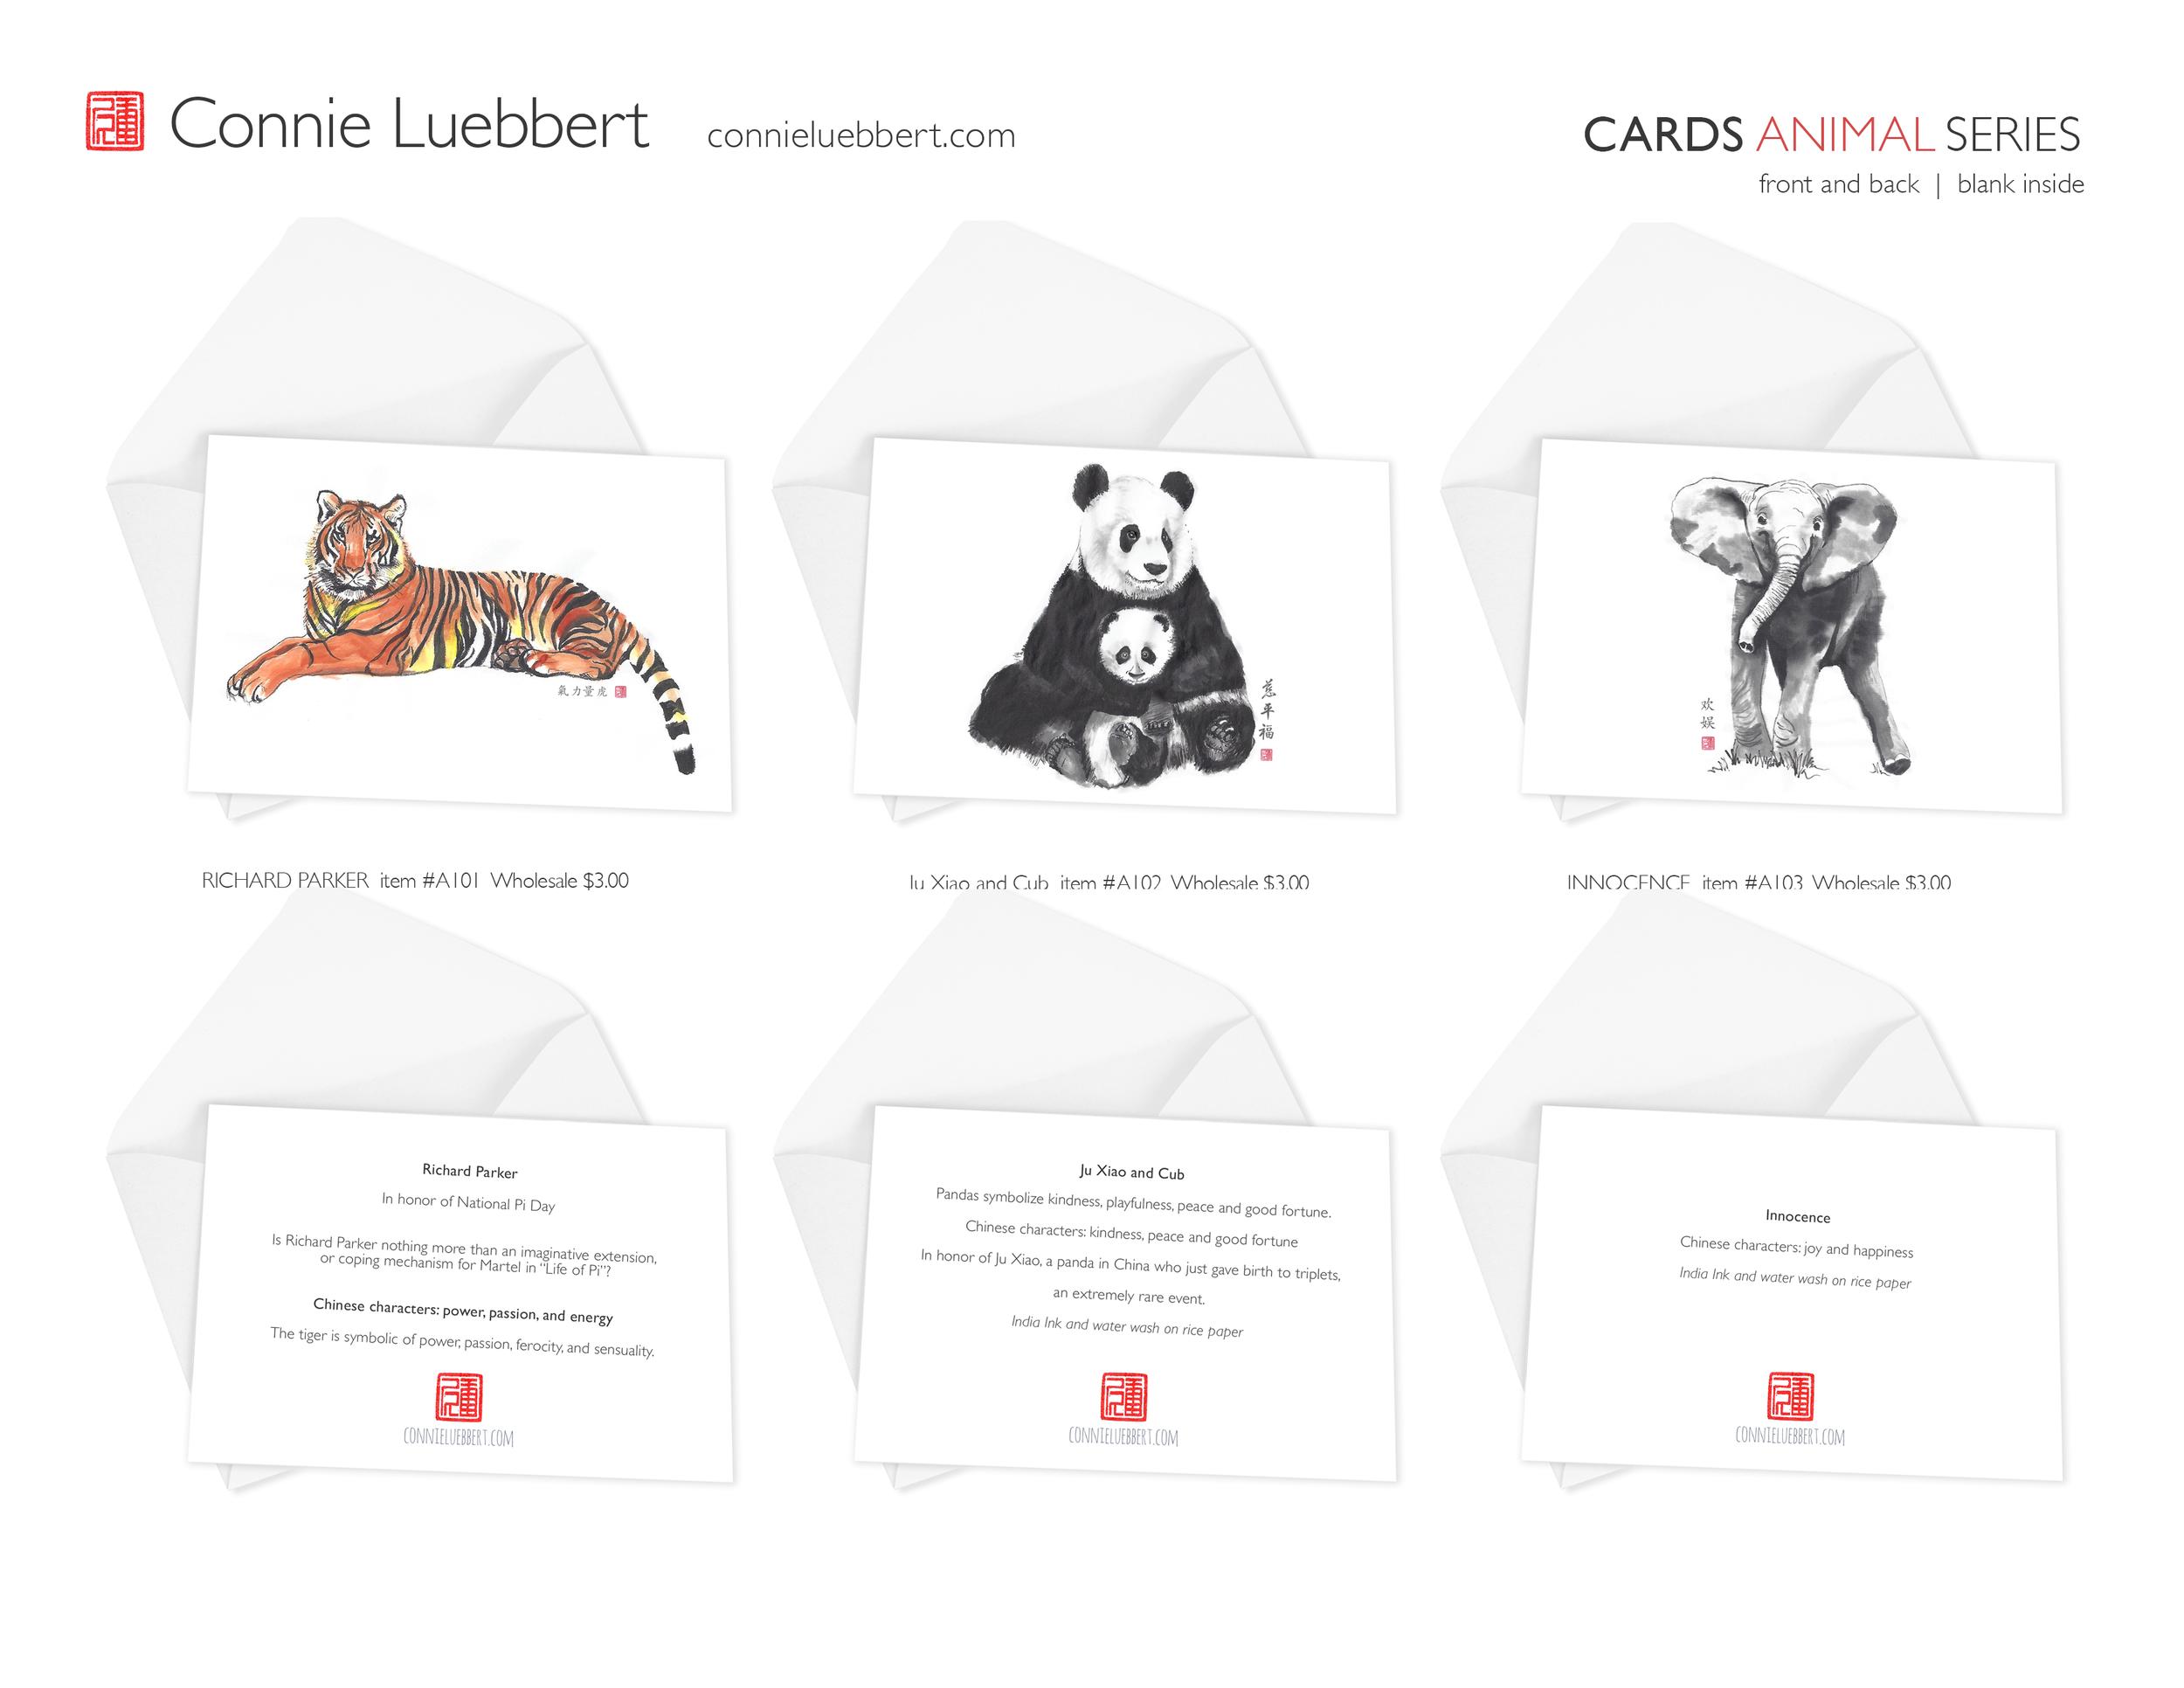 - ANIMAL CARDS: CHARACTERISTICS educational